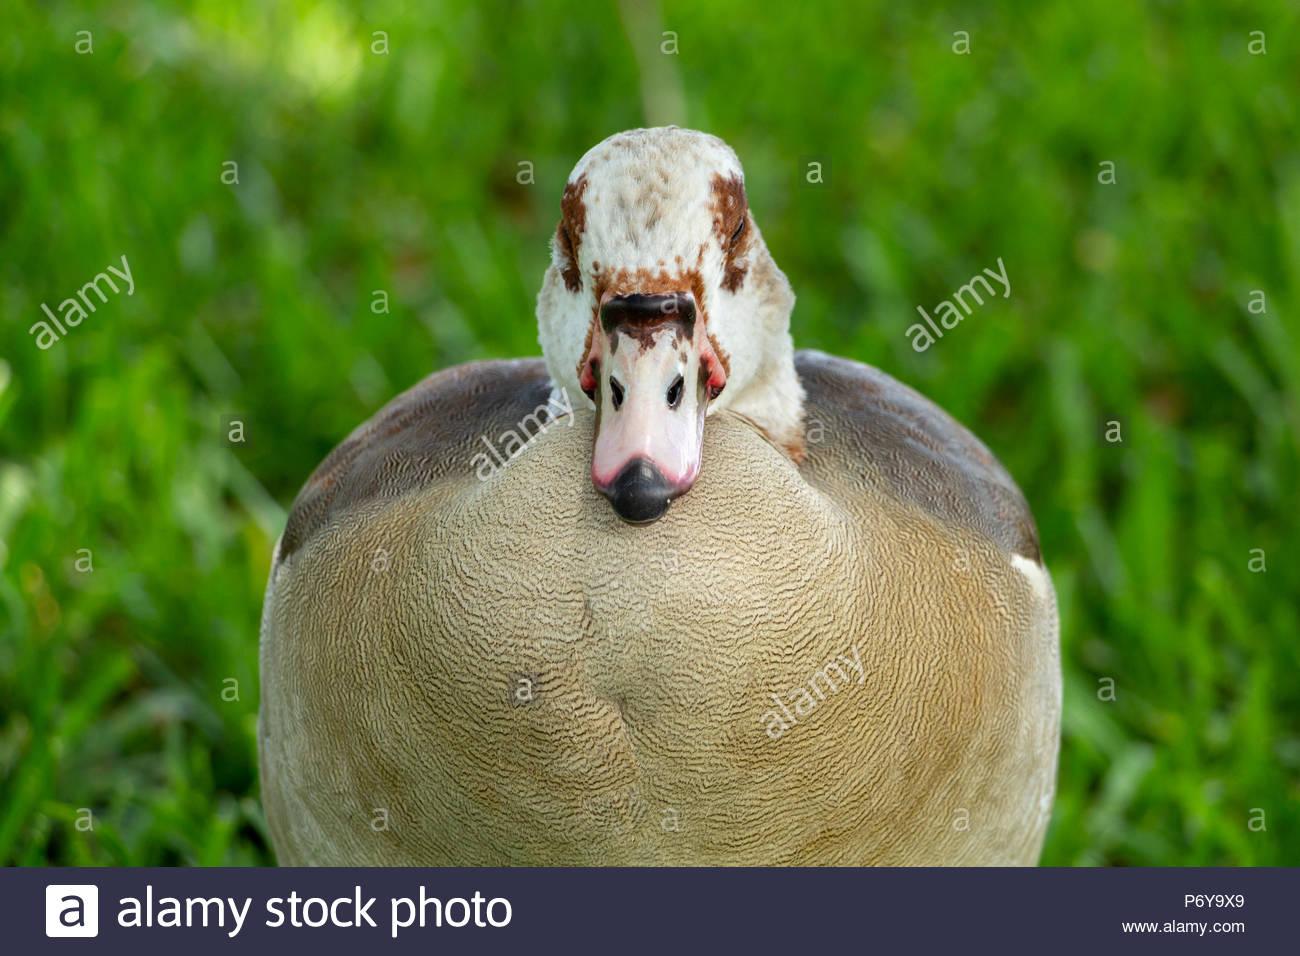 Egyptian goose (Alopochen aegyptiaca) front closeup view, resting with eyes shut - Pembroke Pines, Florida, USA - Stock Image